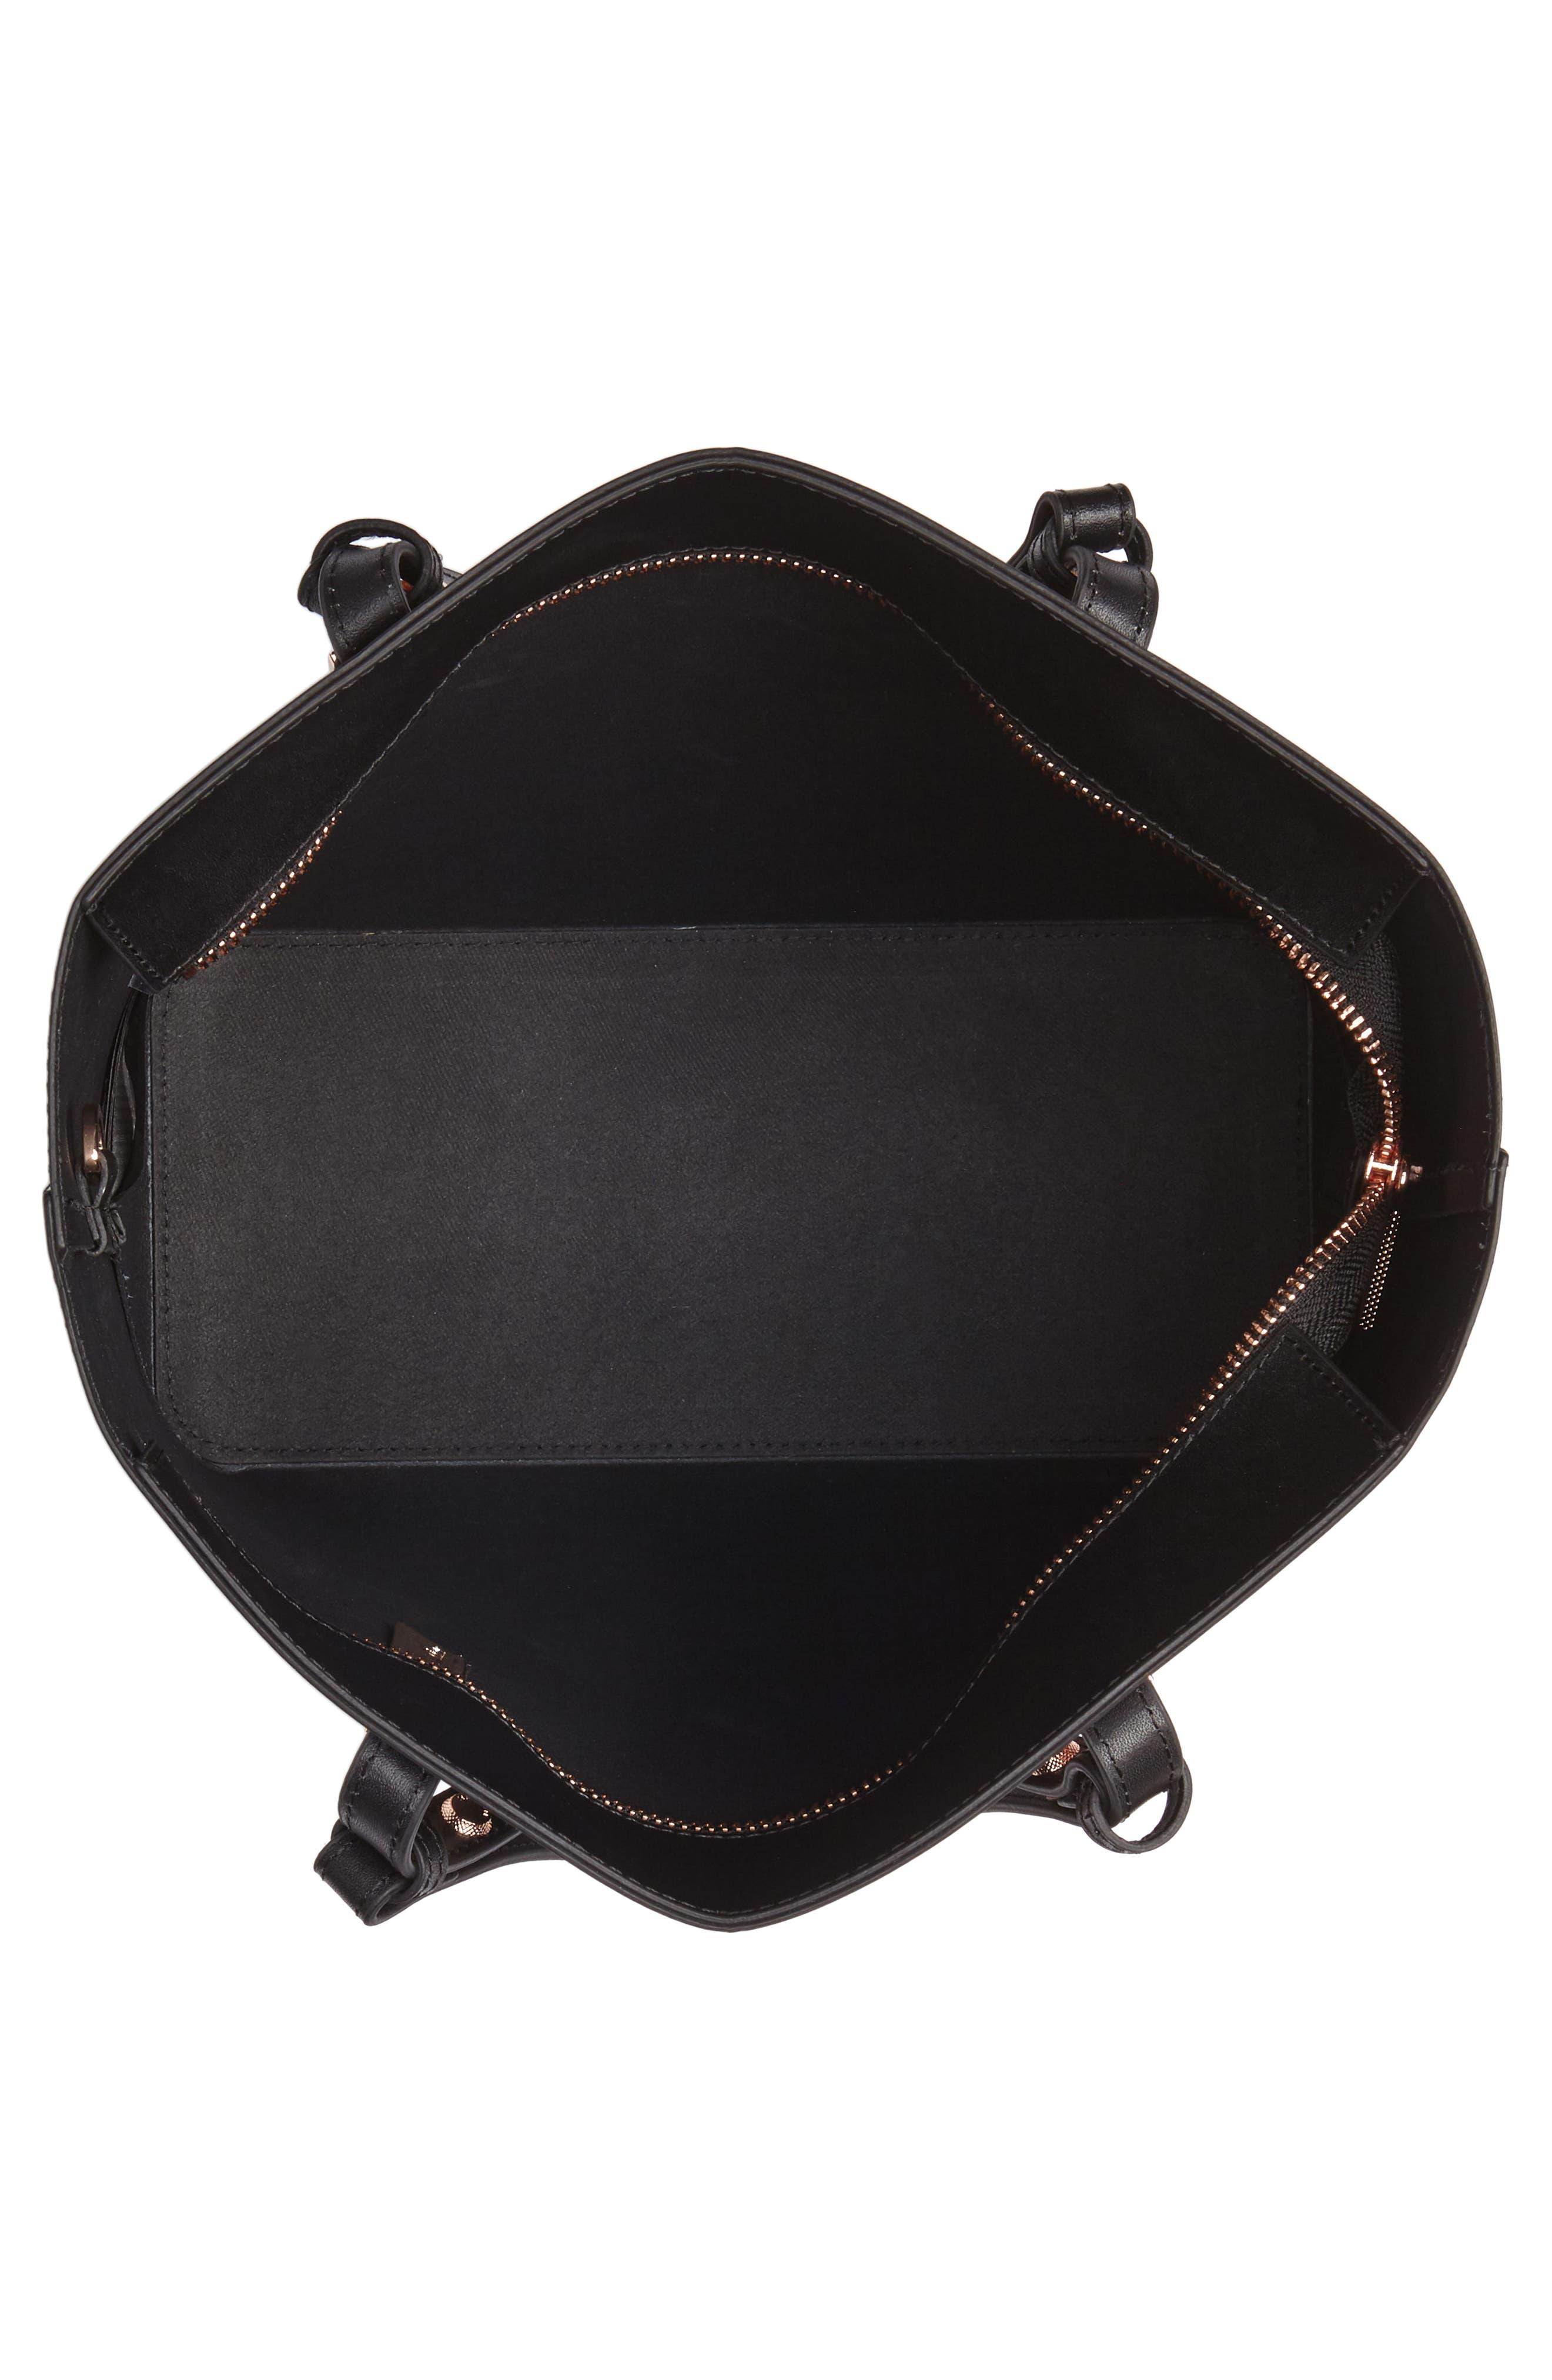 Jaceyy Adjustable Handle Leather Shopper,                             Alternate thumbnail 4, color,                             Black